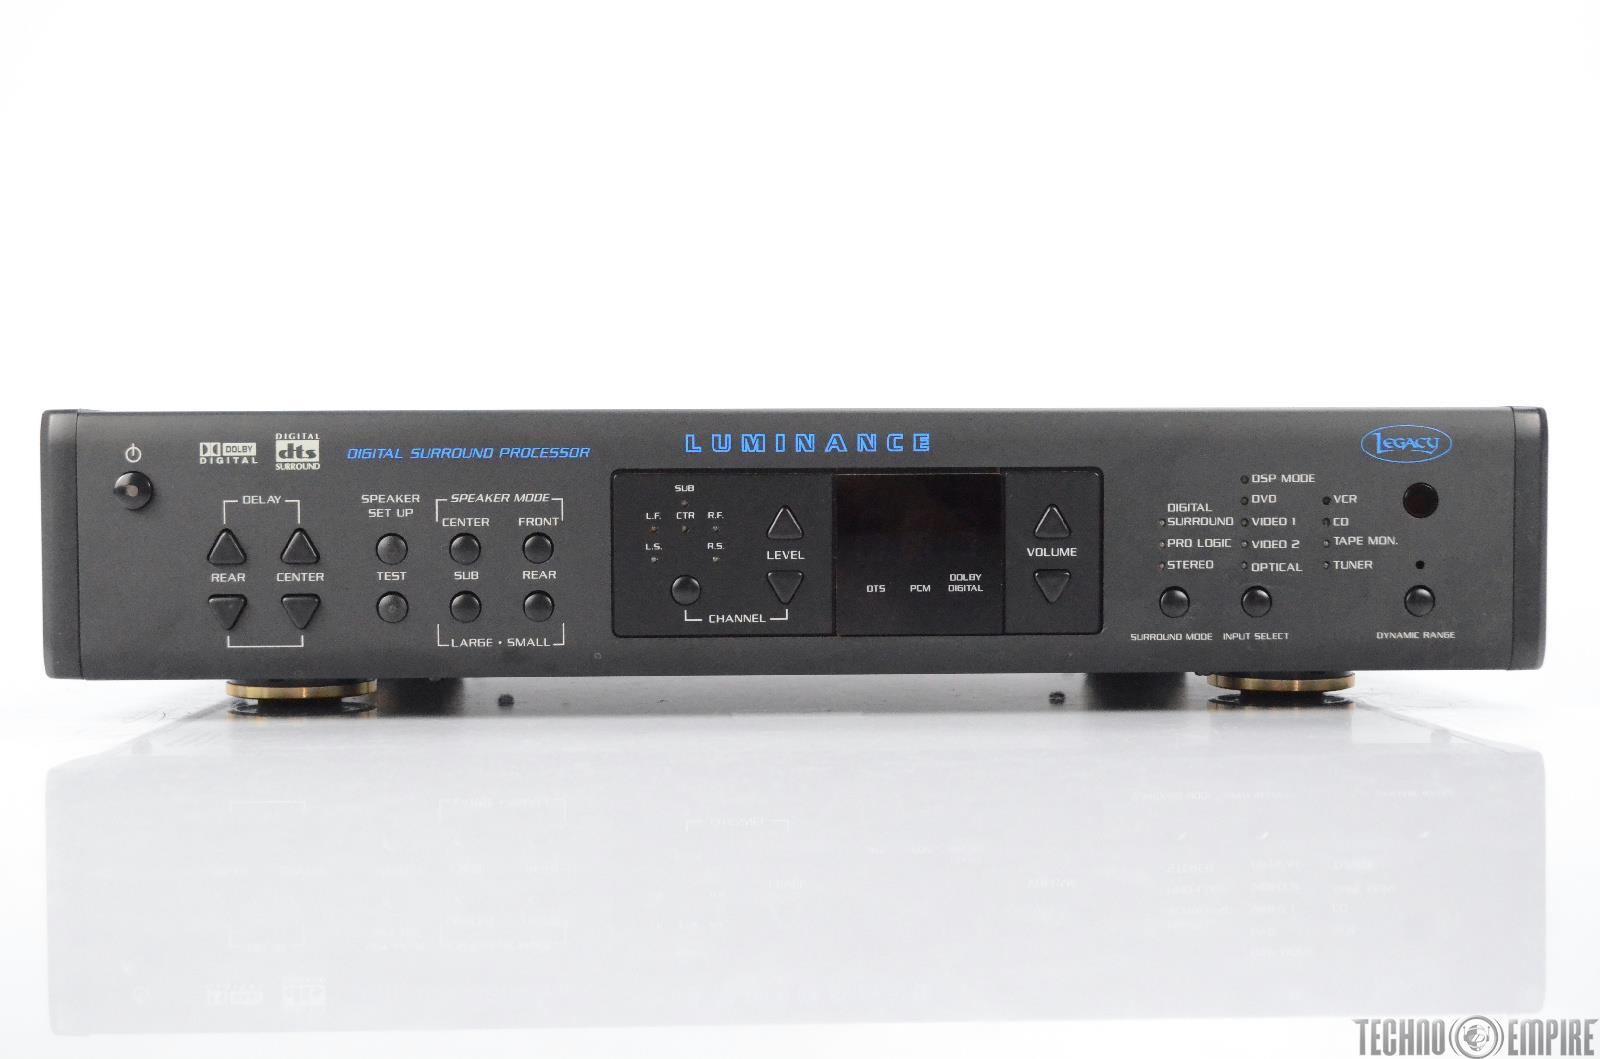 Legacy Luminance Digital Surround Processor Dolby Digital DTS #30744